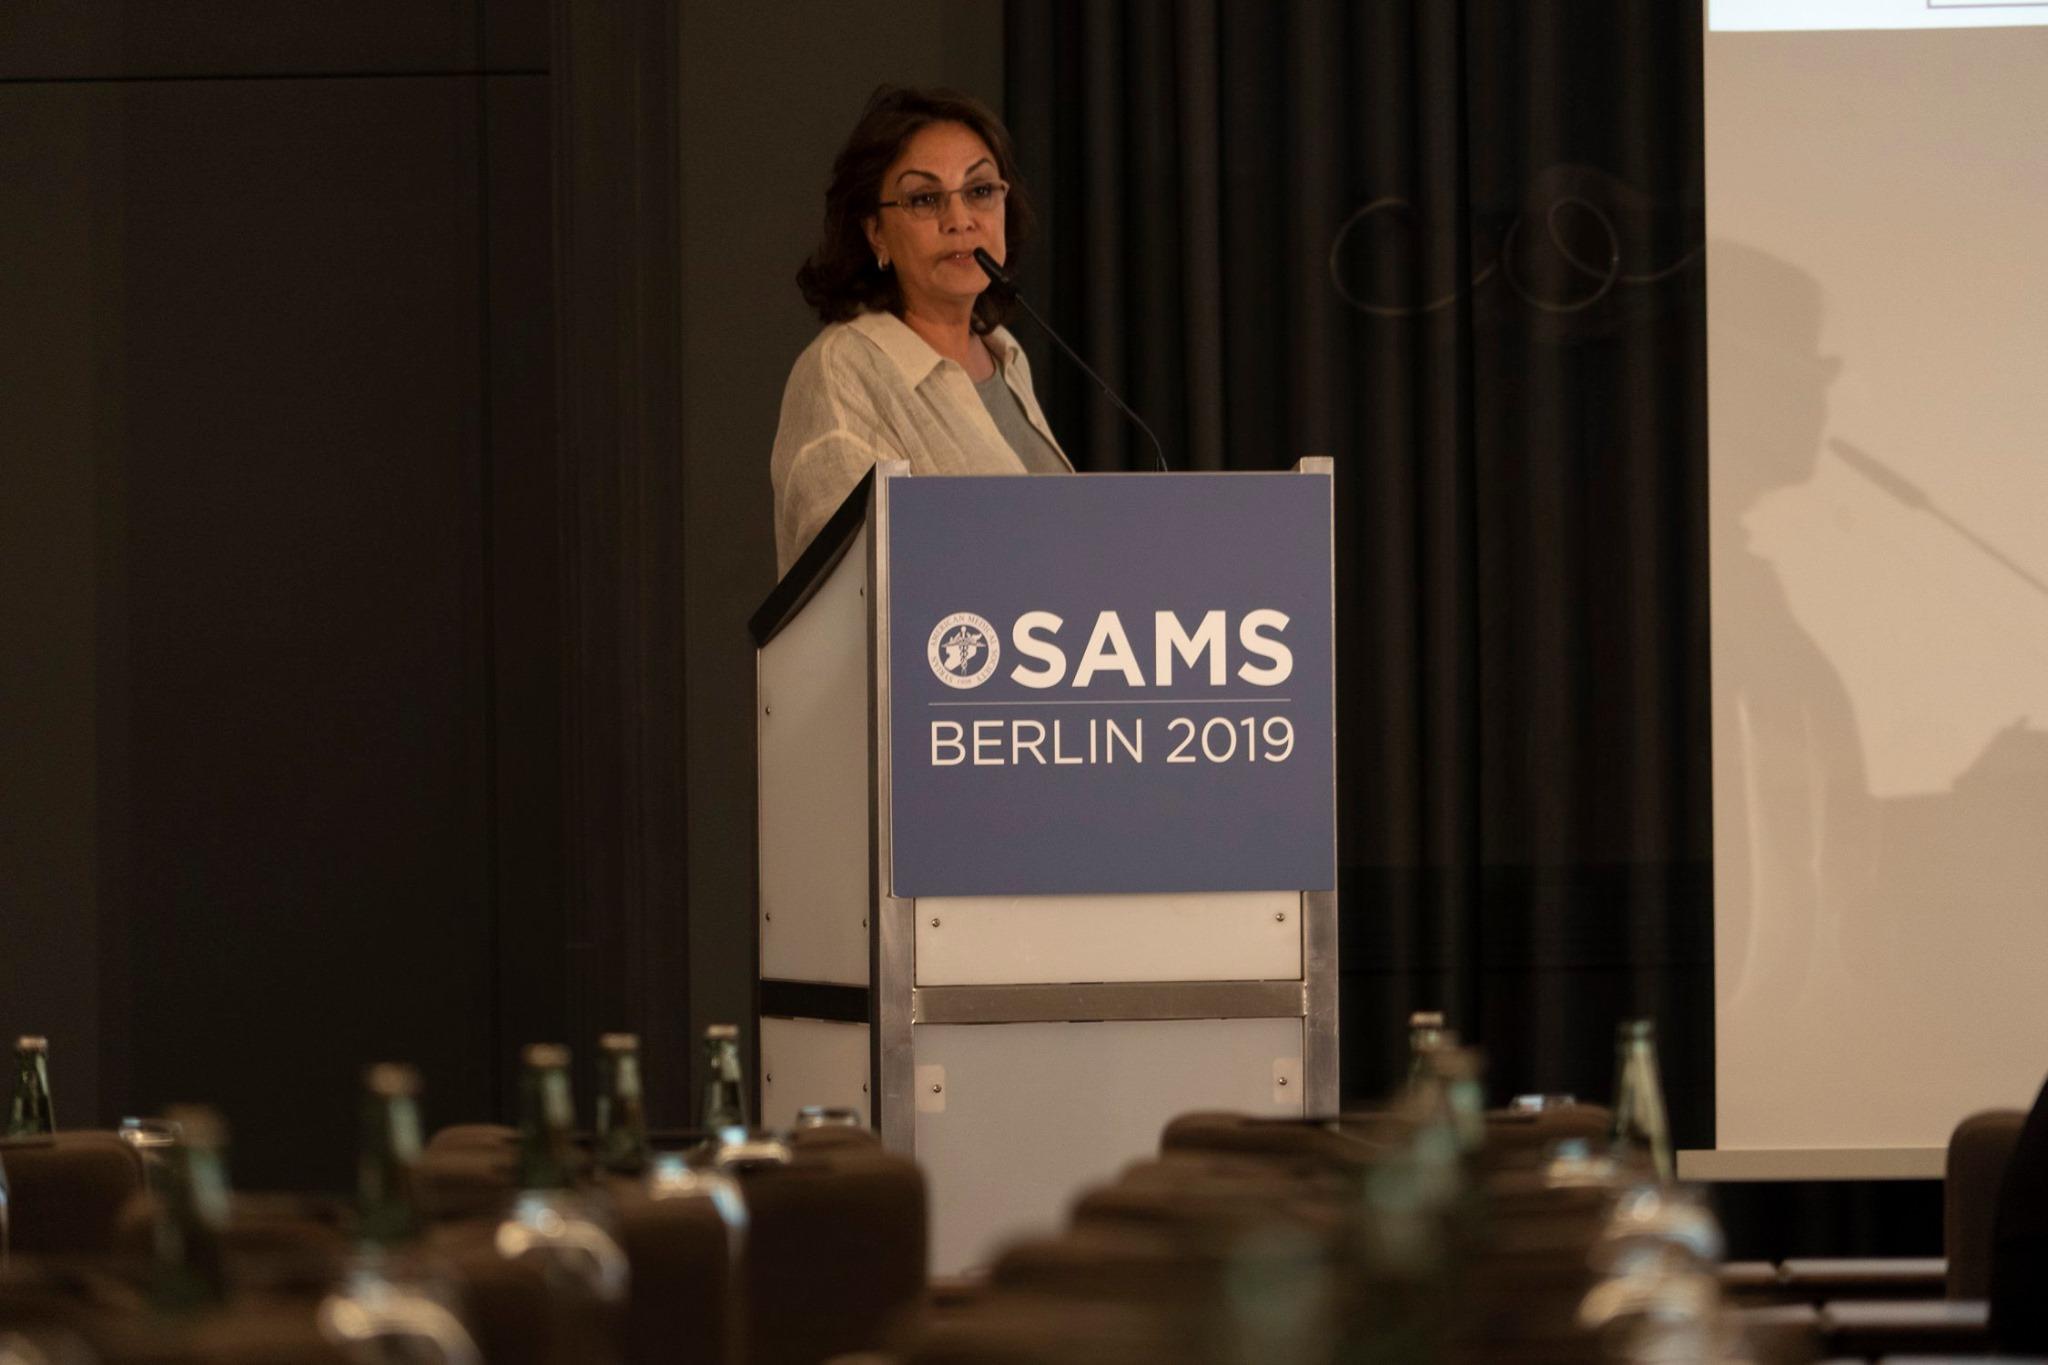 SAMS 19th International Conference in Berlin